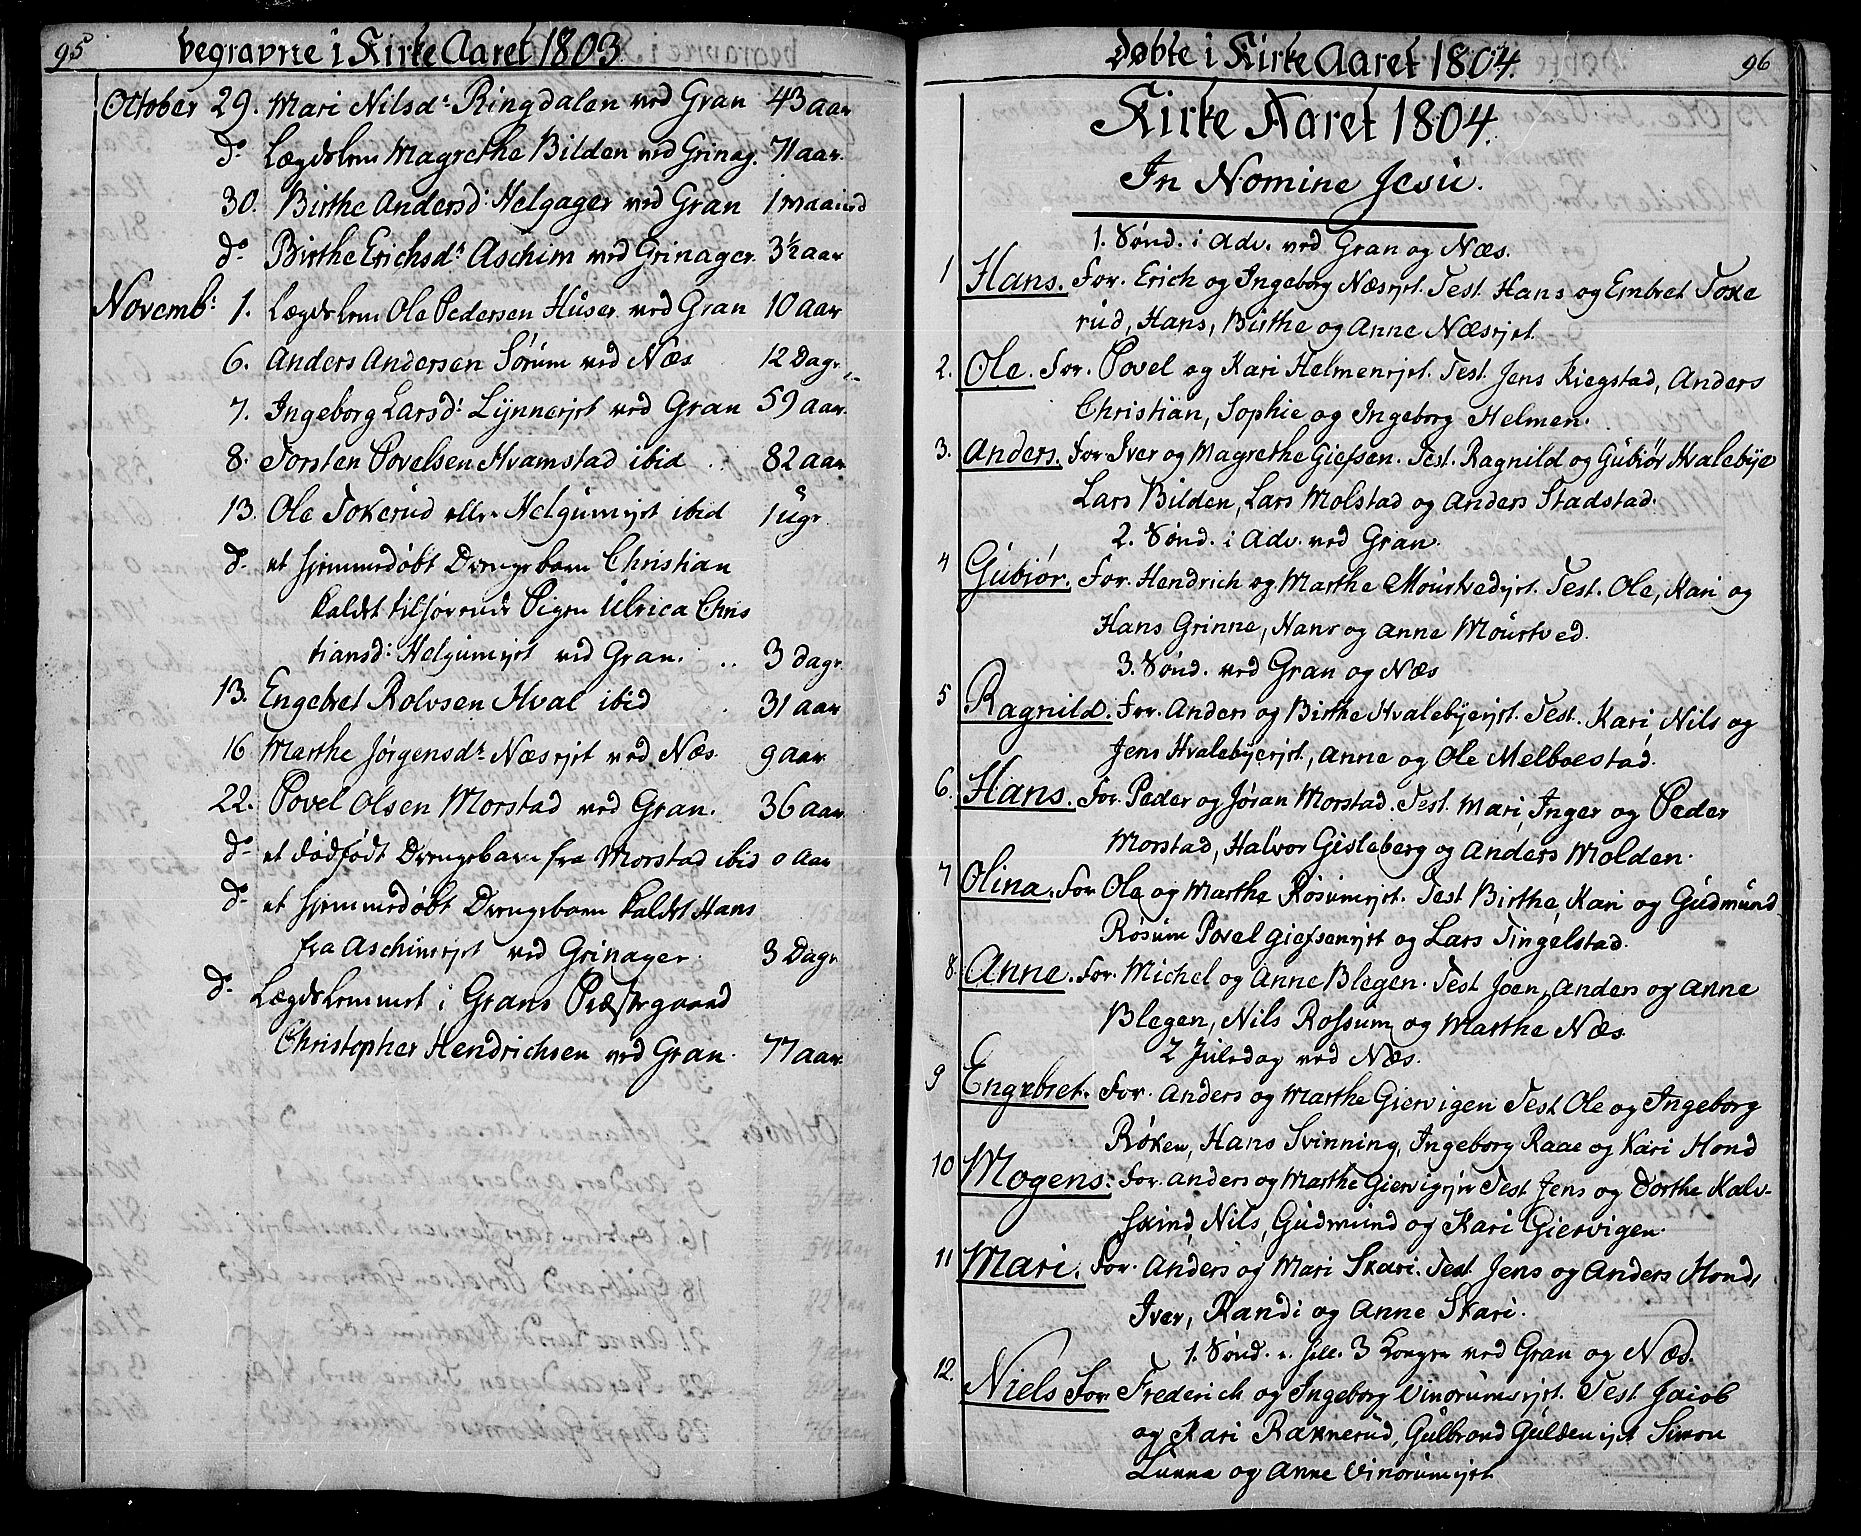 SAH, Gran prestekontor, Ministerialbok nr. 8, 1798-1811, s. 95-96